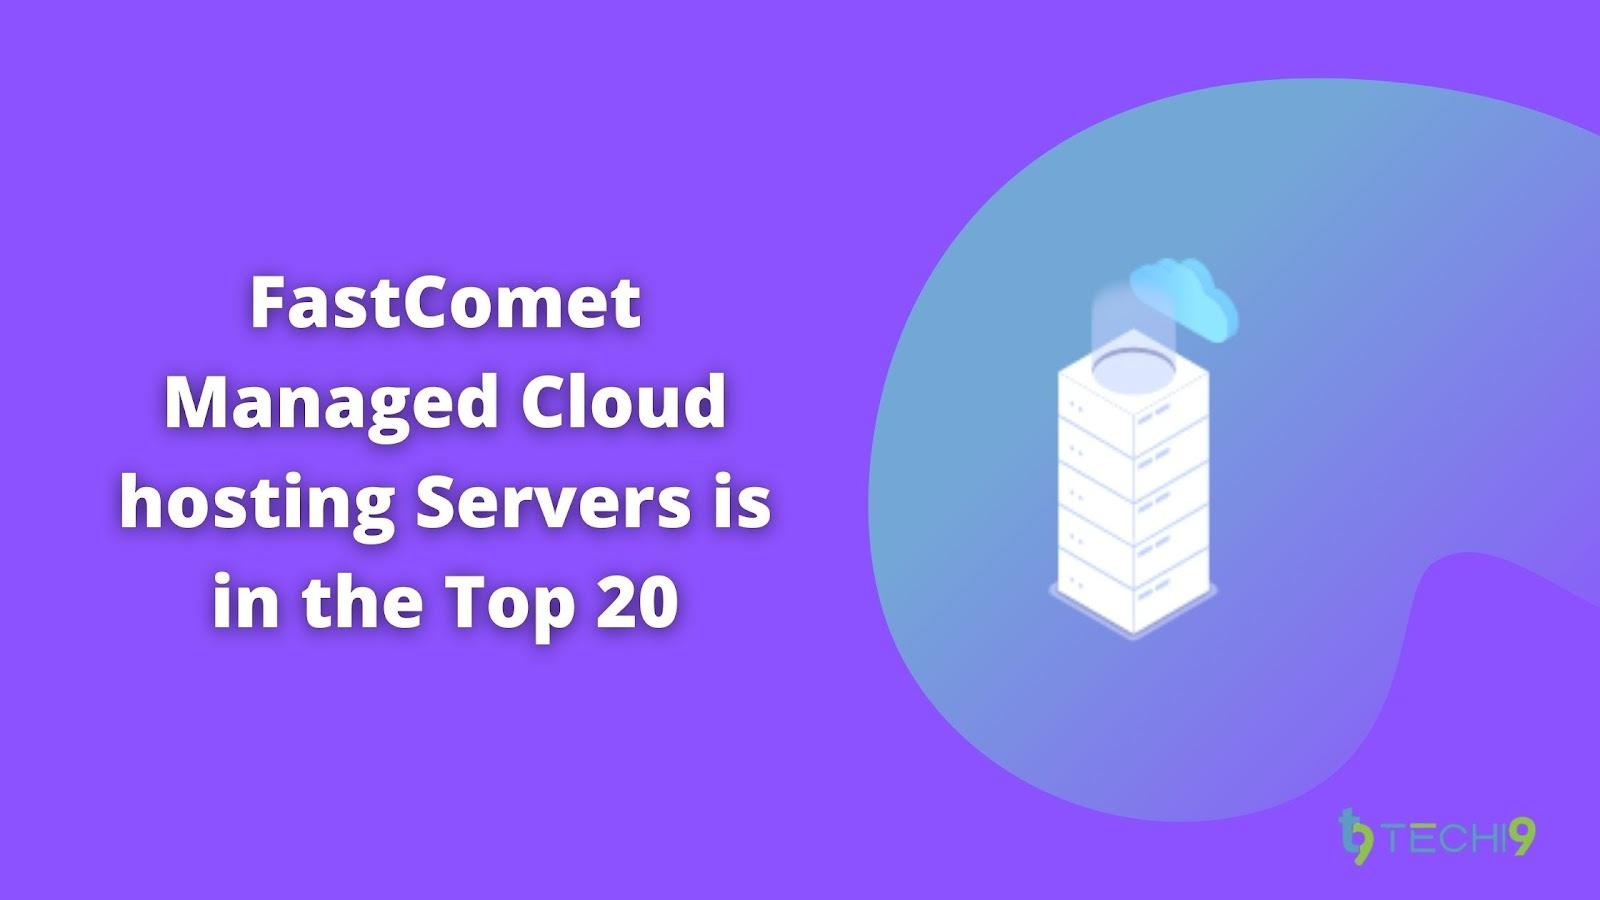 FastComet Managed Cloud hosting Servers is in the Top 20